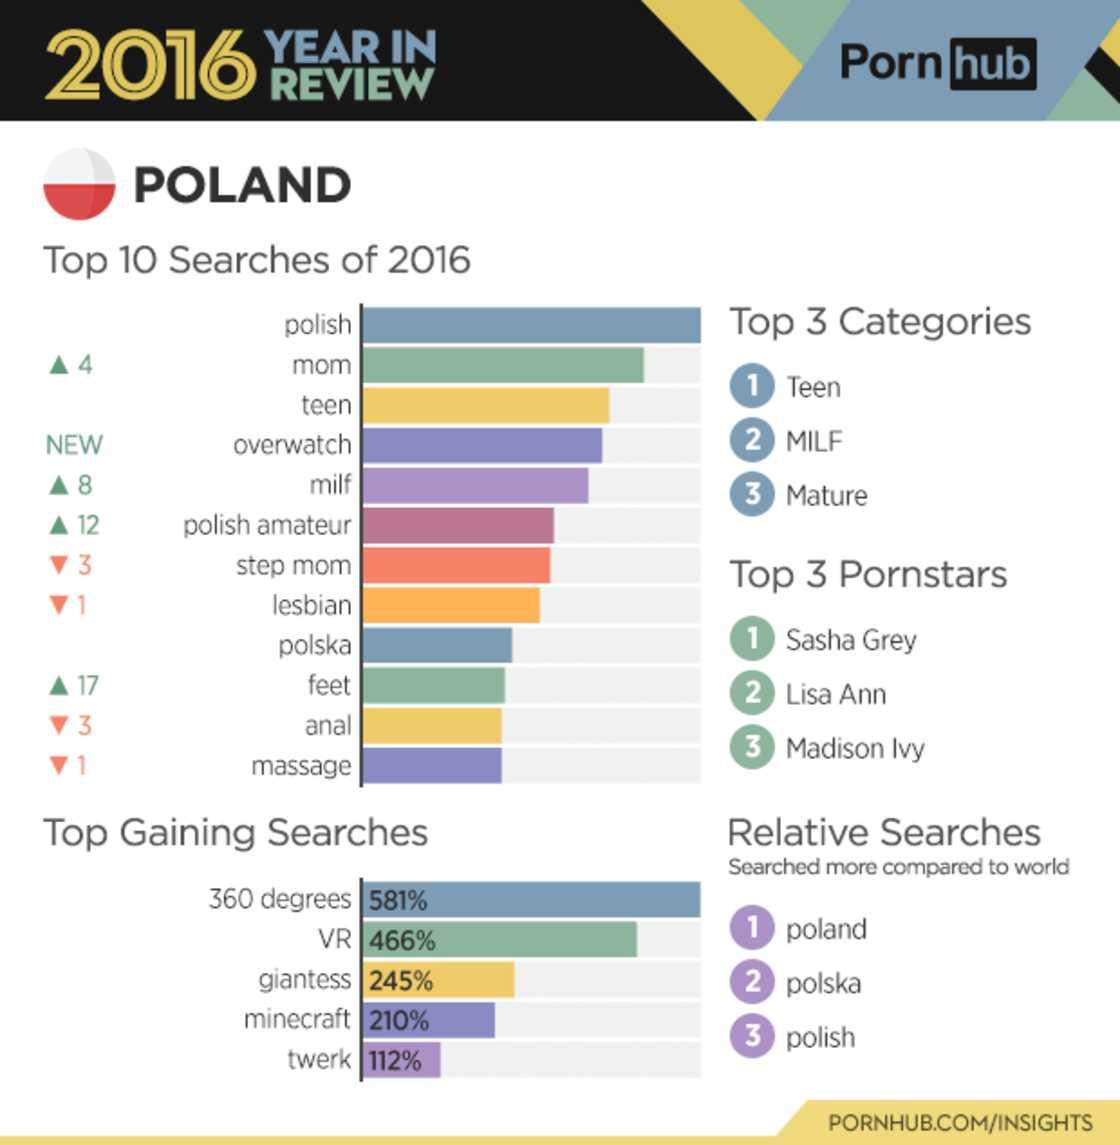 pornhub-en-chiffres-annee-2016-5